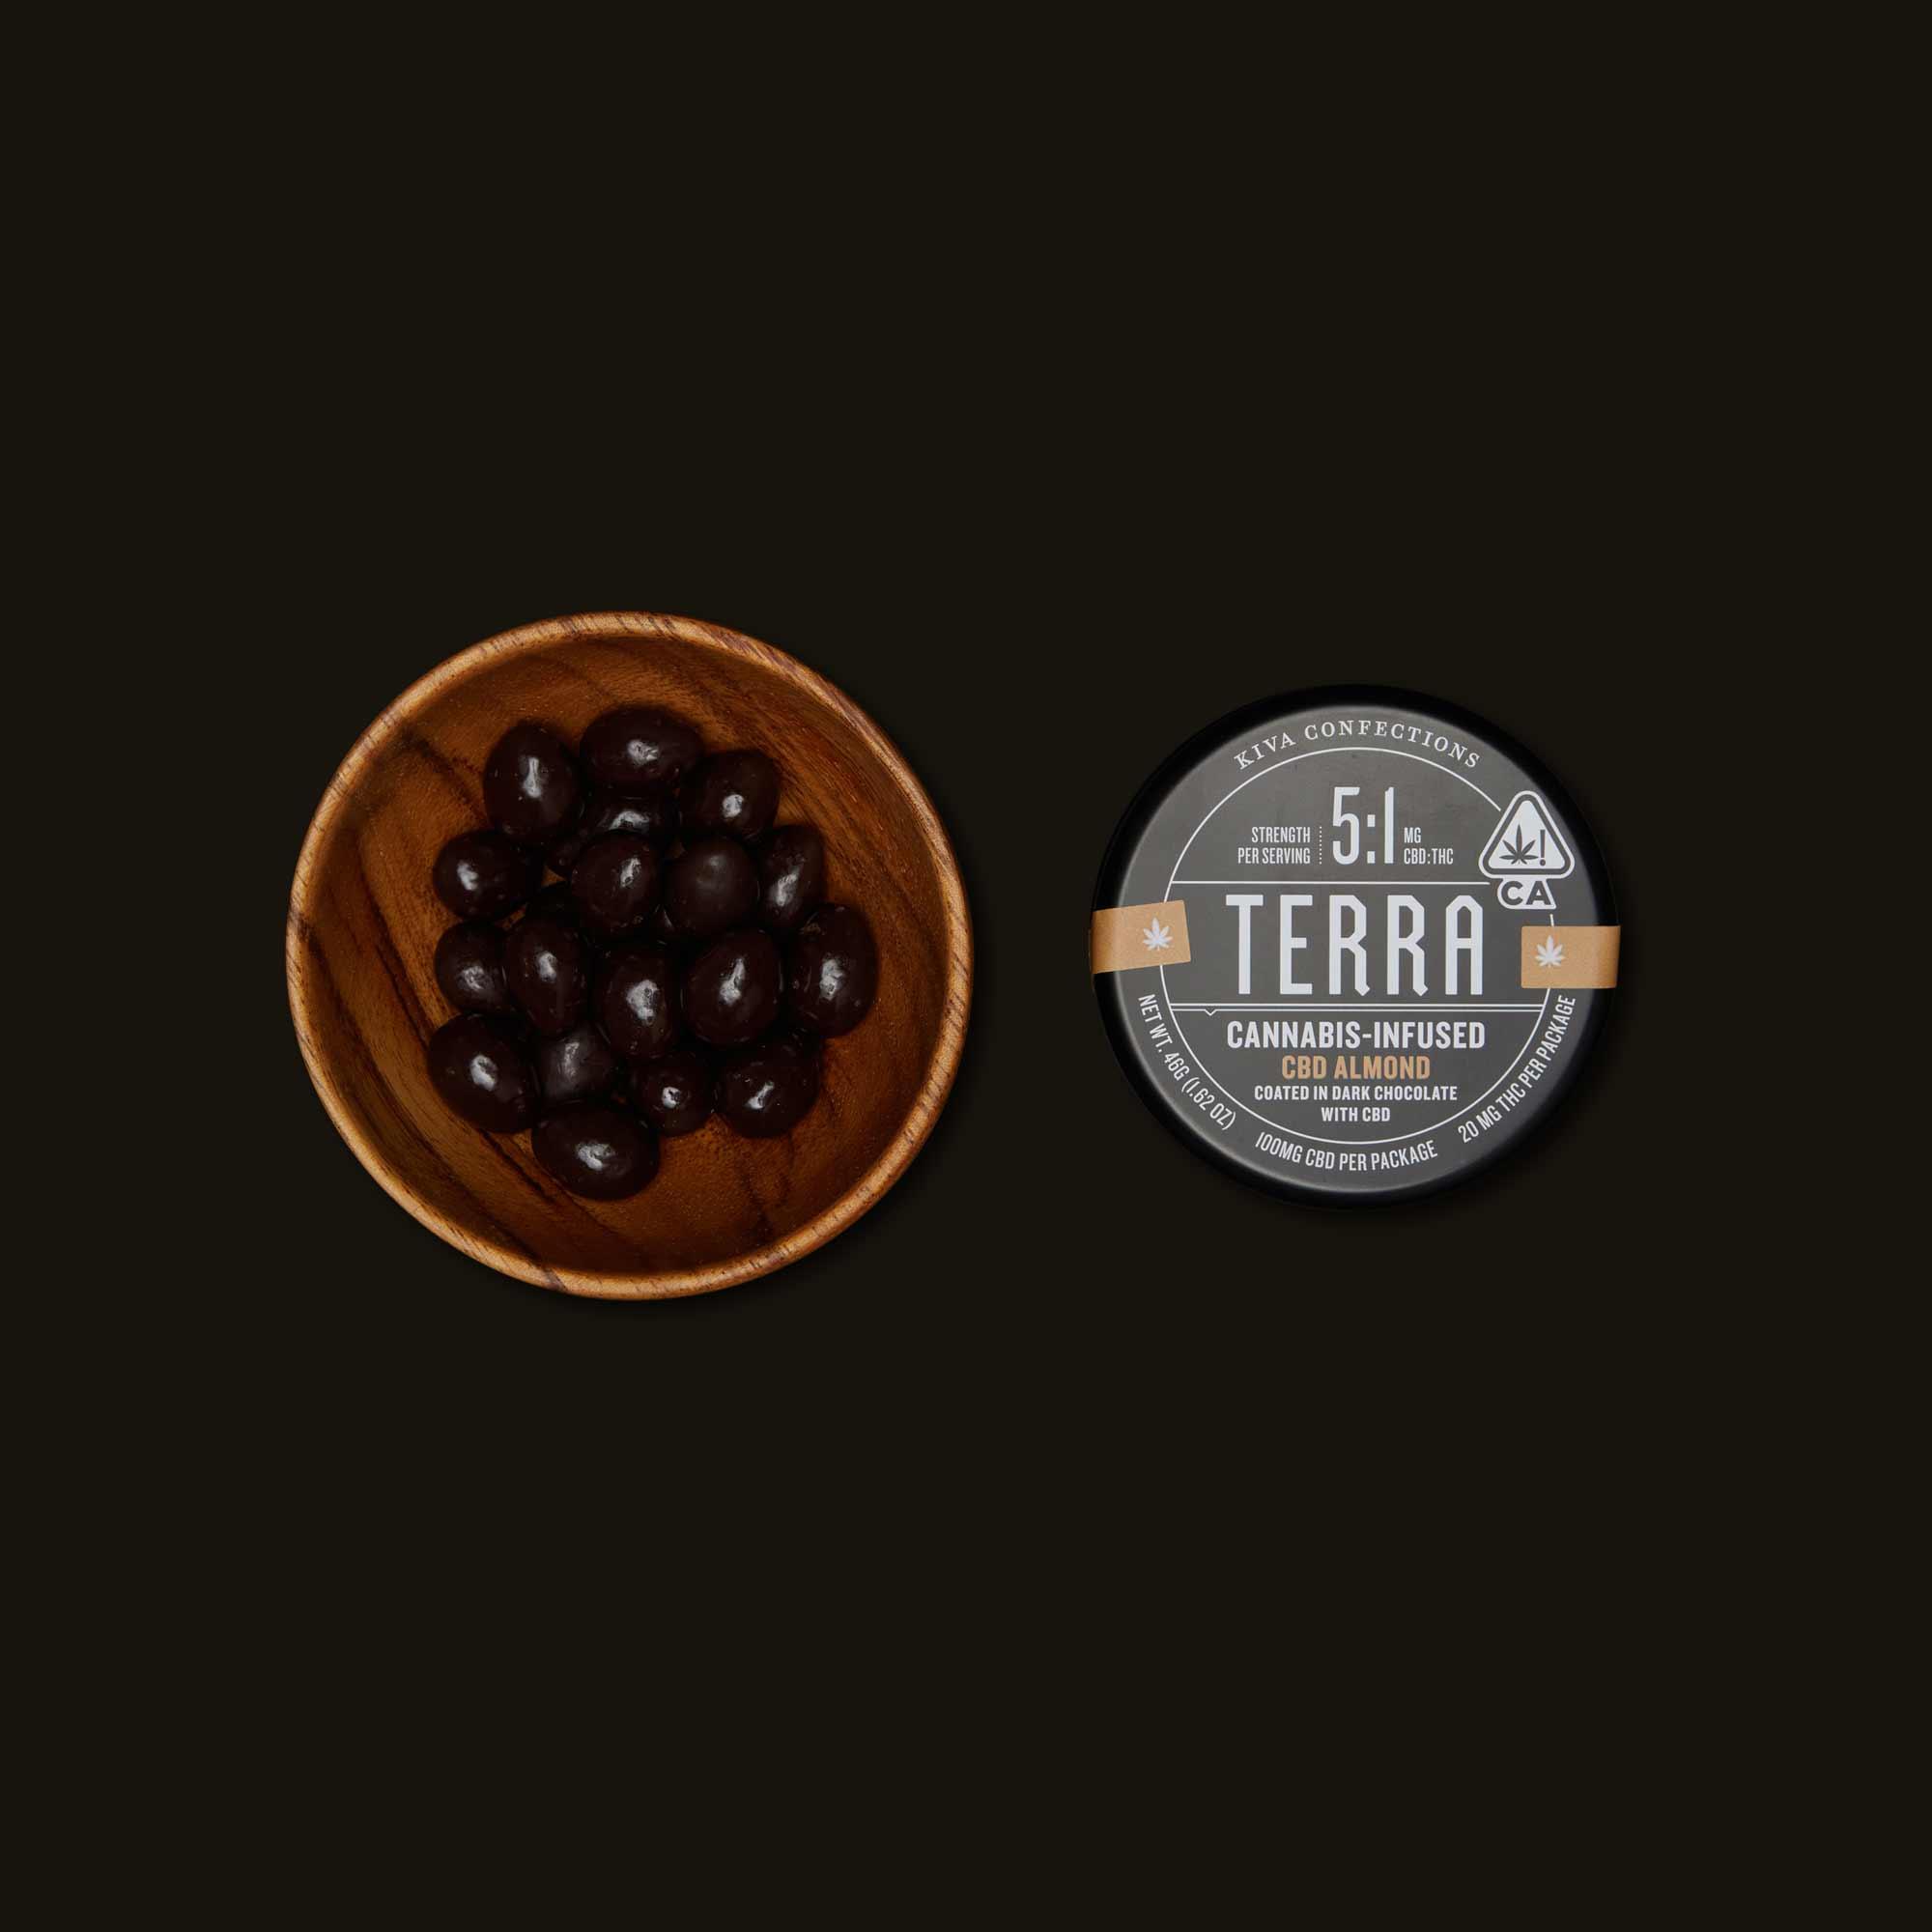 Kiva Confections Terra CBD Almond Bites